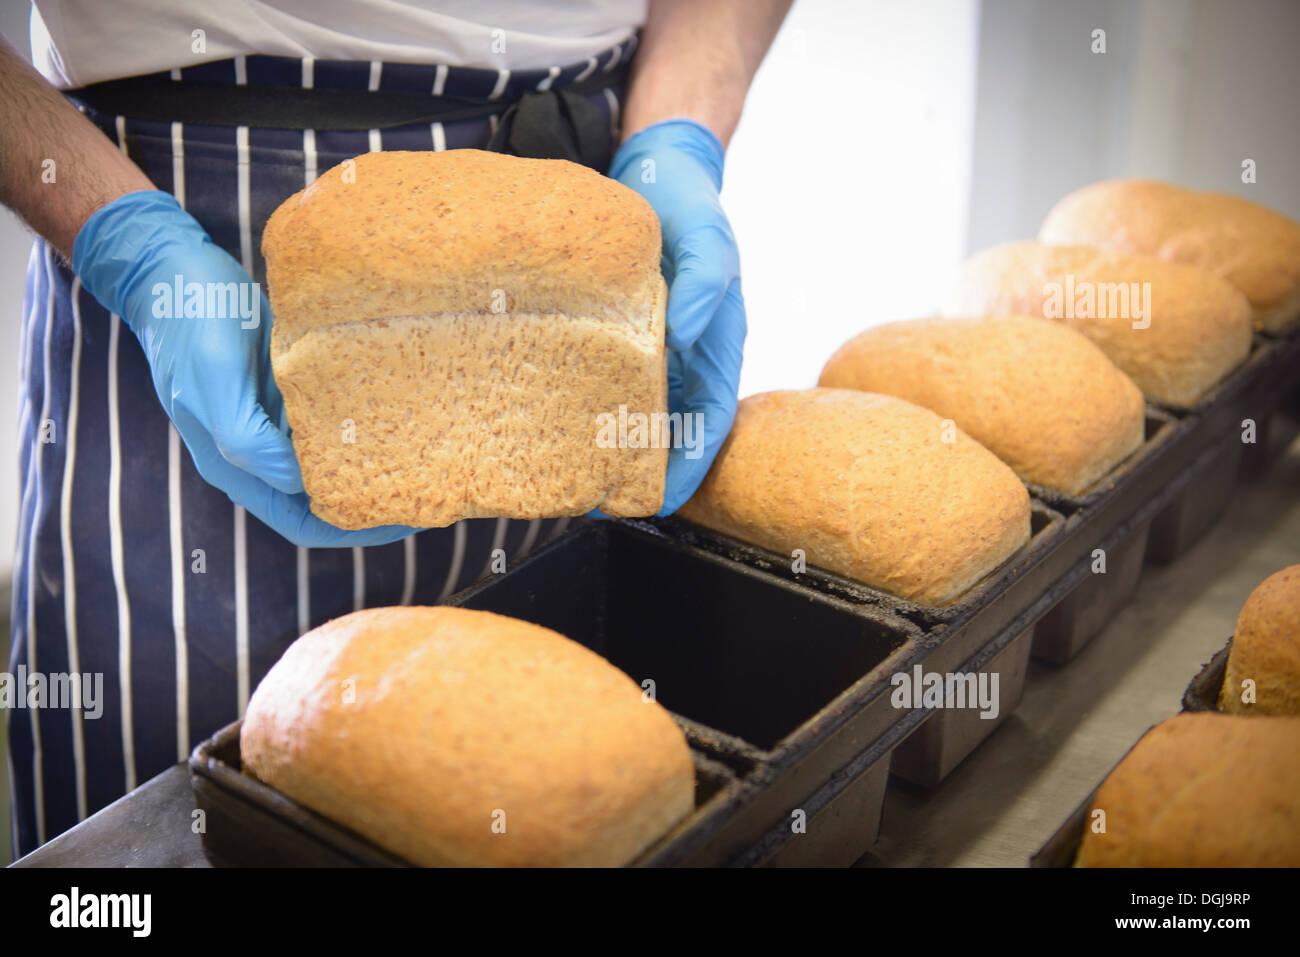 Baker holding loaf of freshly baked bread Stock Photo